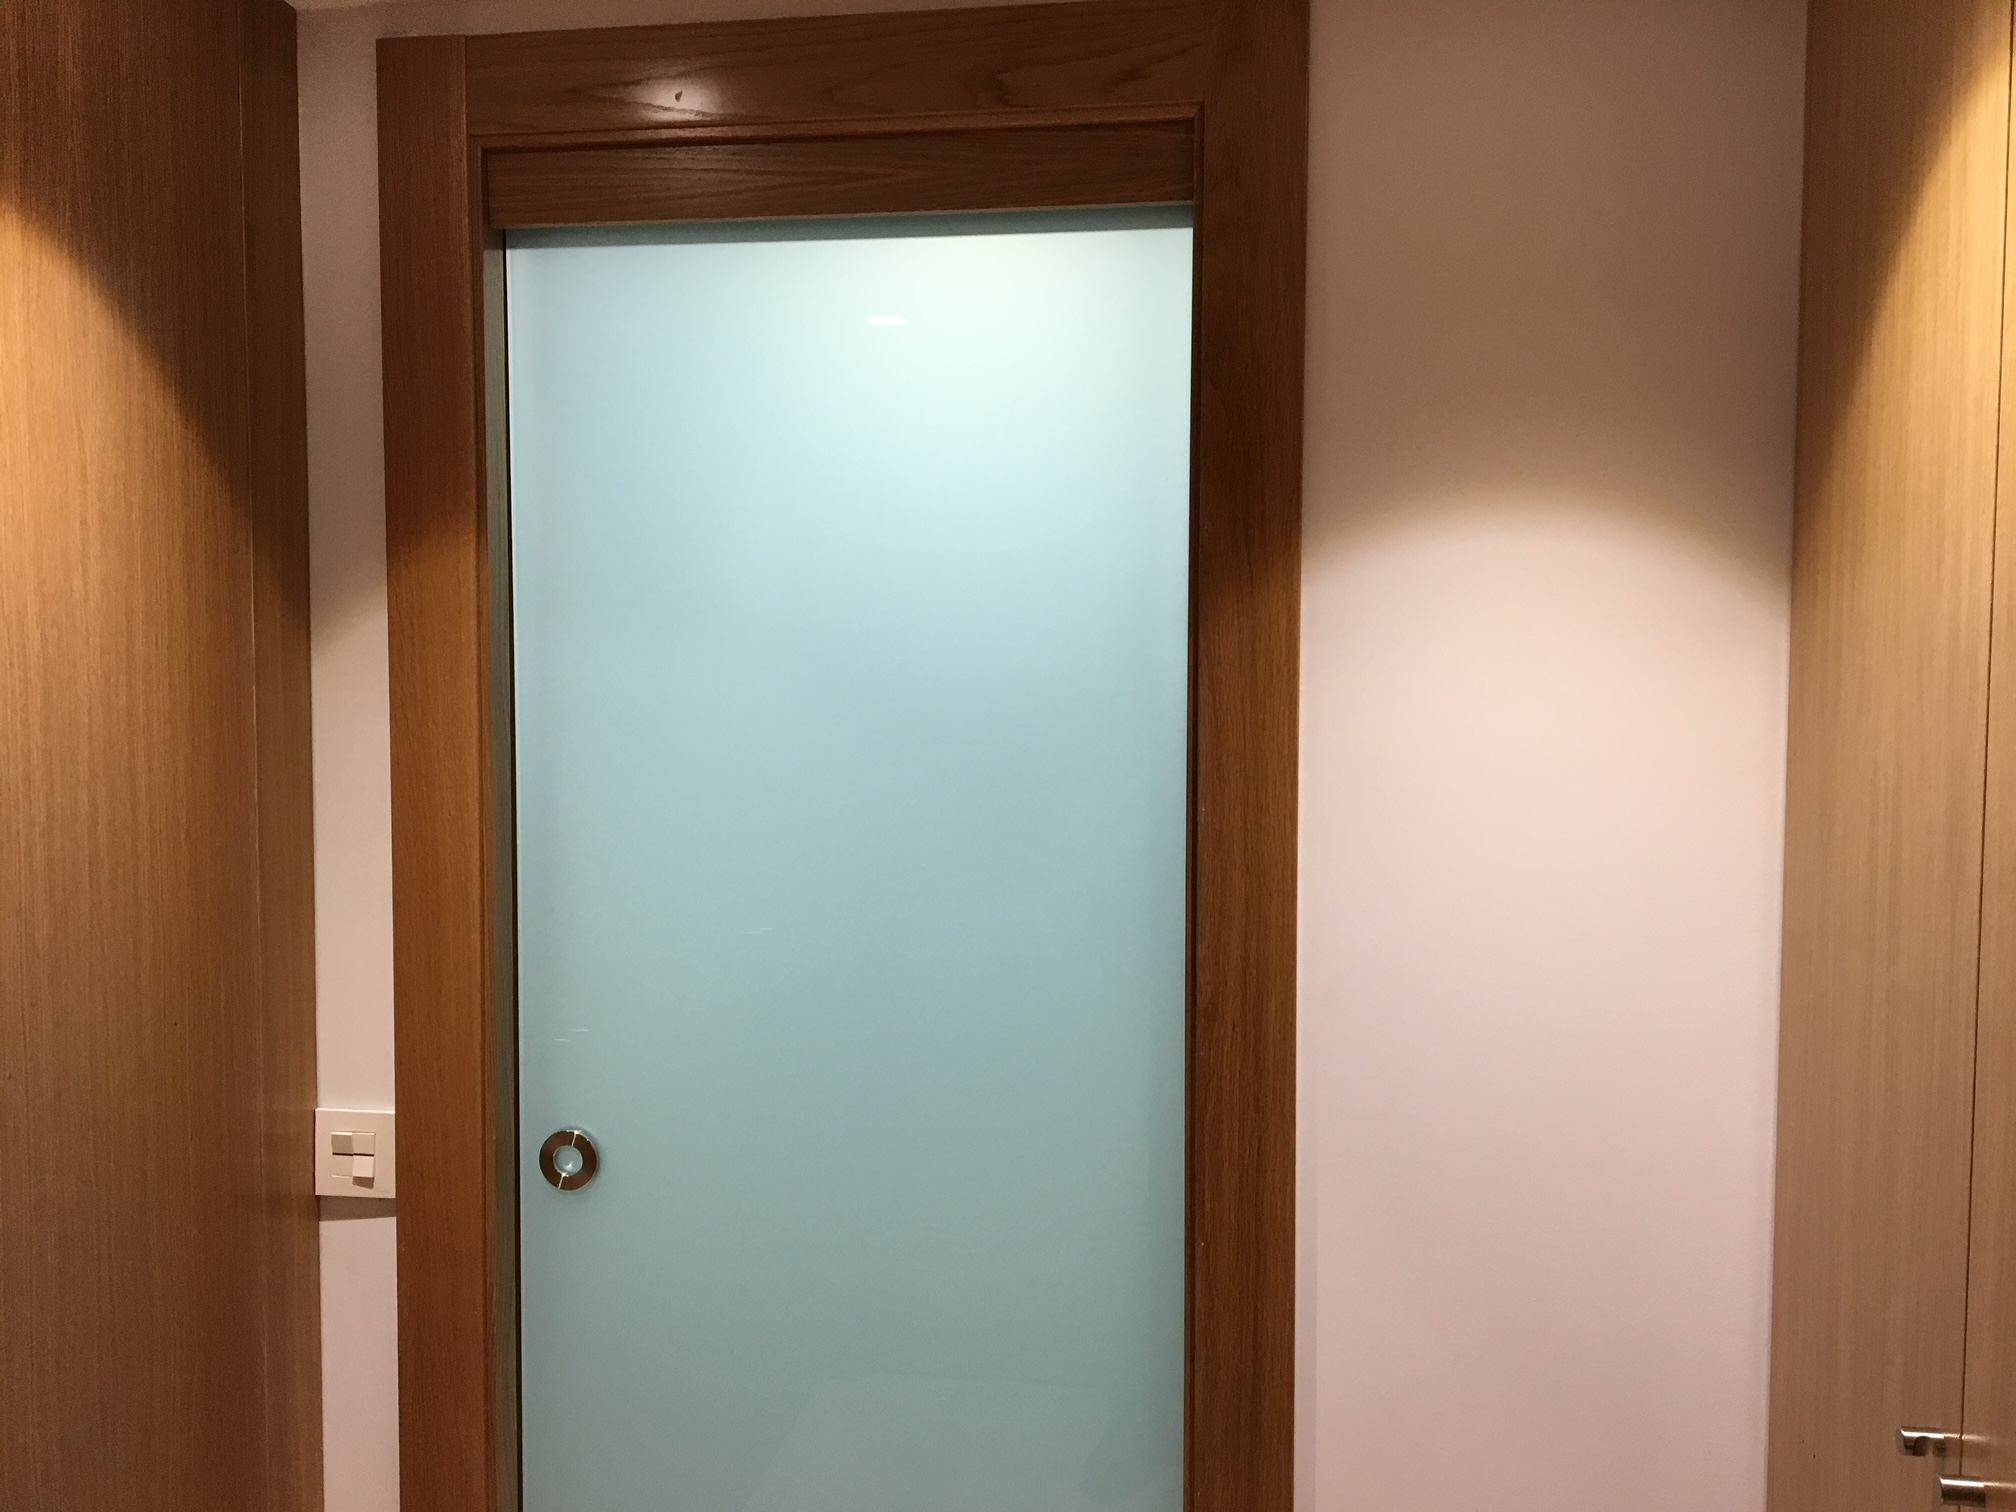 Puerta de cristal para ba o - Puertas de entrada con cristal ...